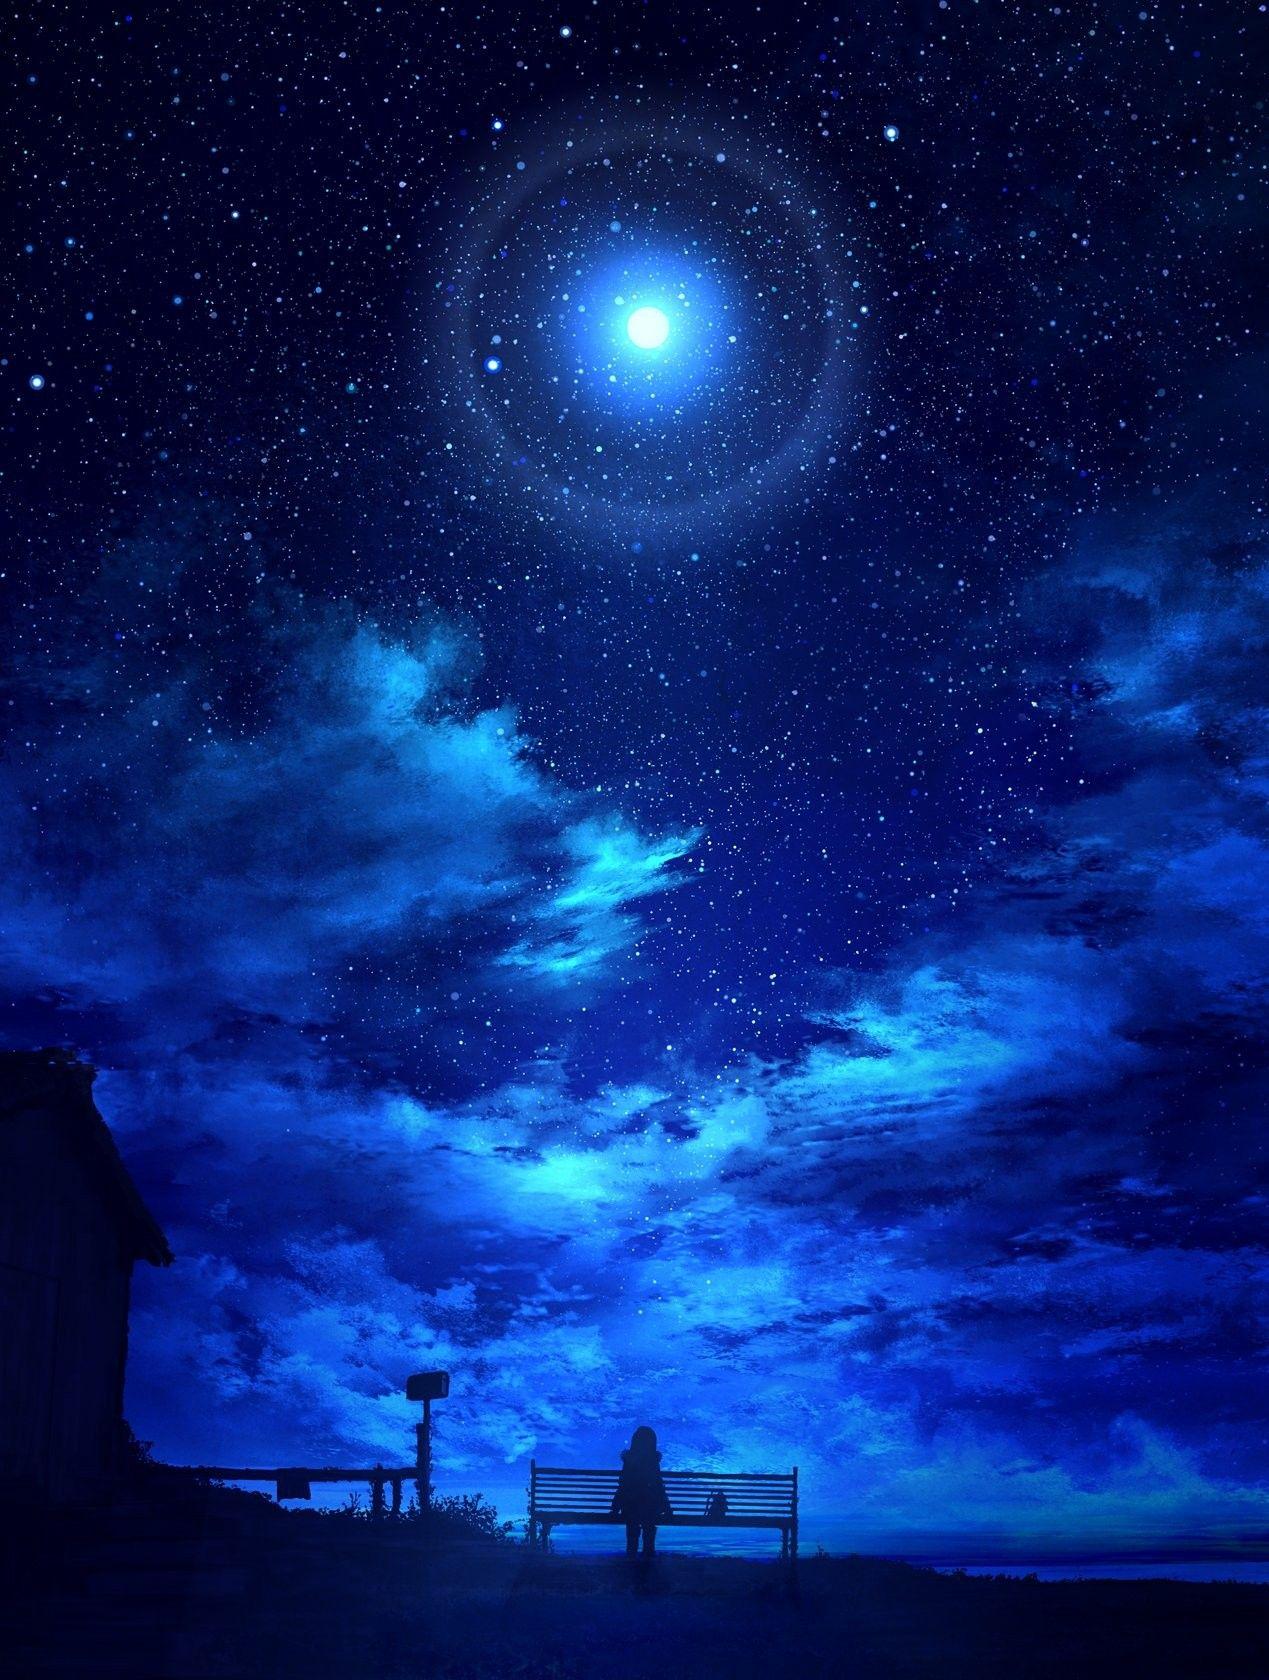 Artist Mks Mks Fstd Night Sky Wallpaper Anime Scenery Scenery Wallpaper